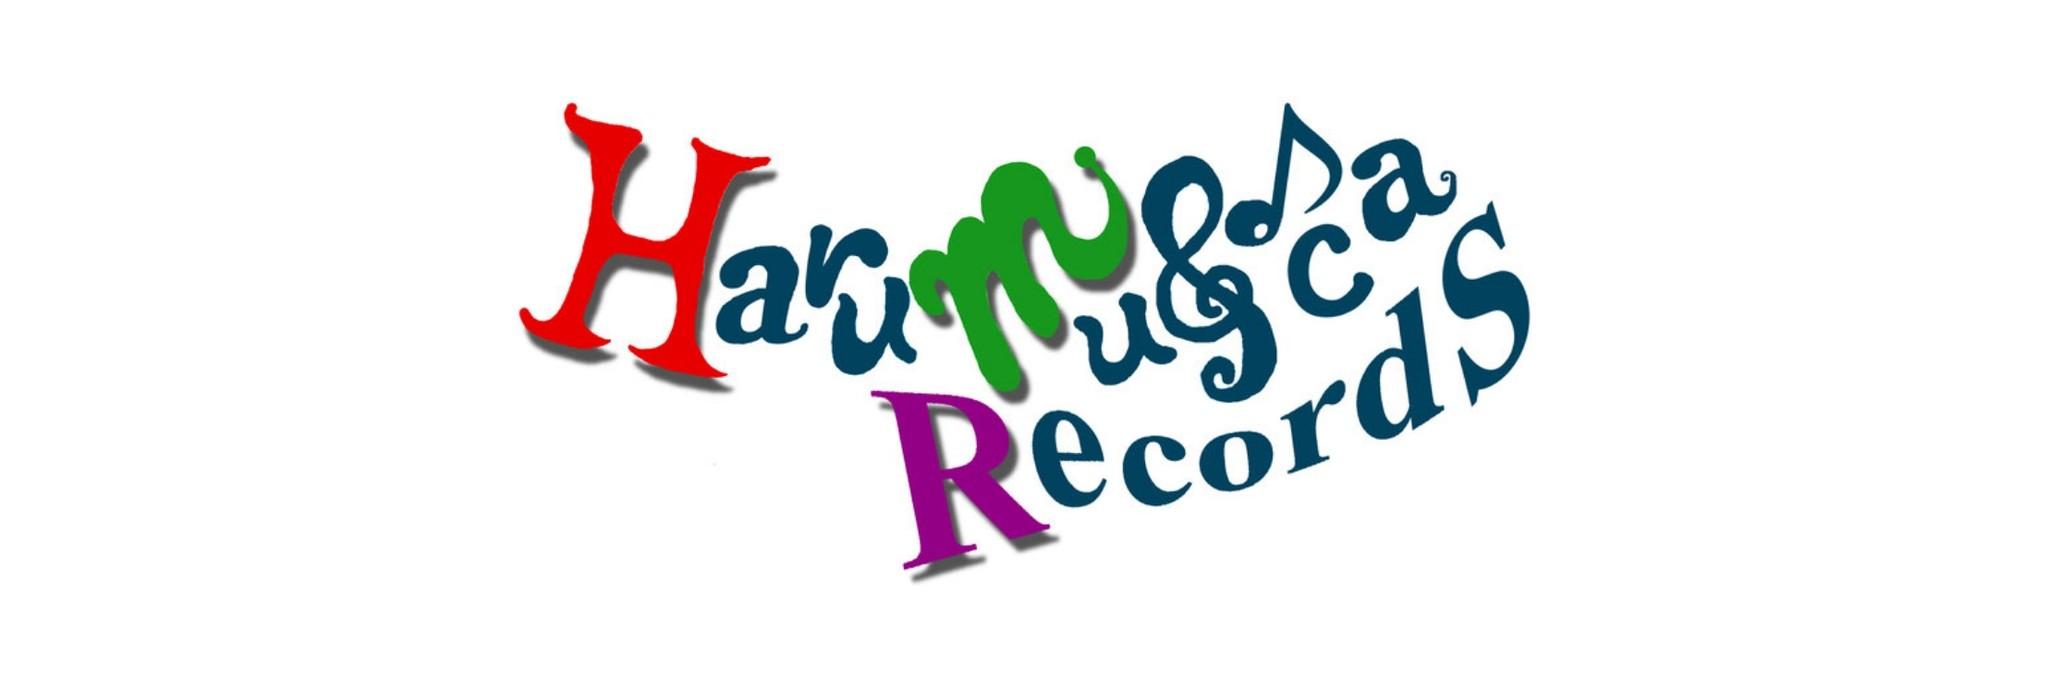 Harumusica Records